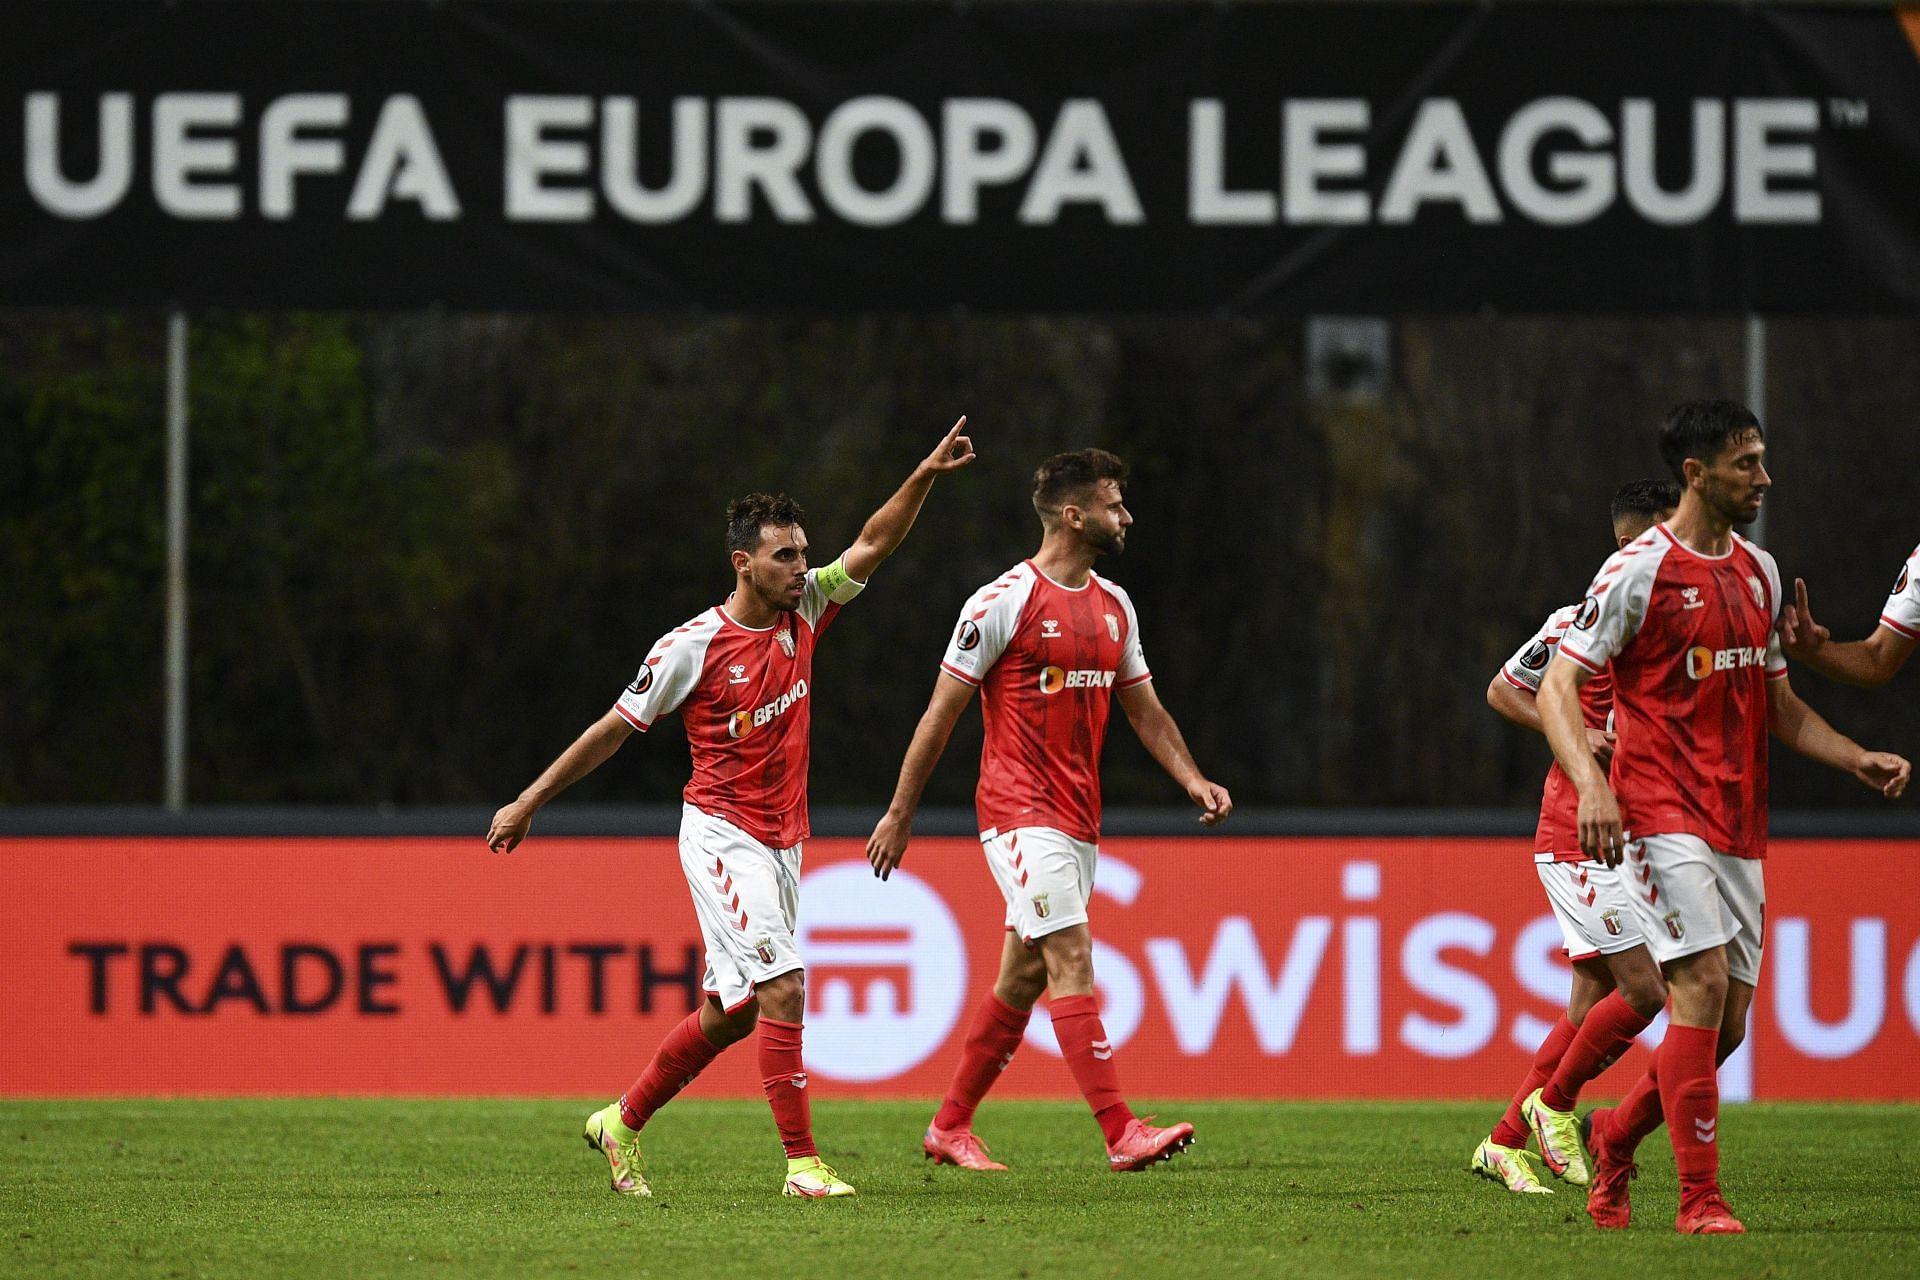 Ludogorets vs Sporting Braga prediction, preview, team news and more | UEFA Europa League 2021-22 - Sportskeeda